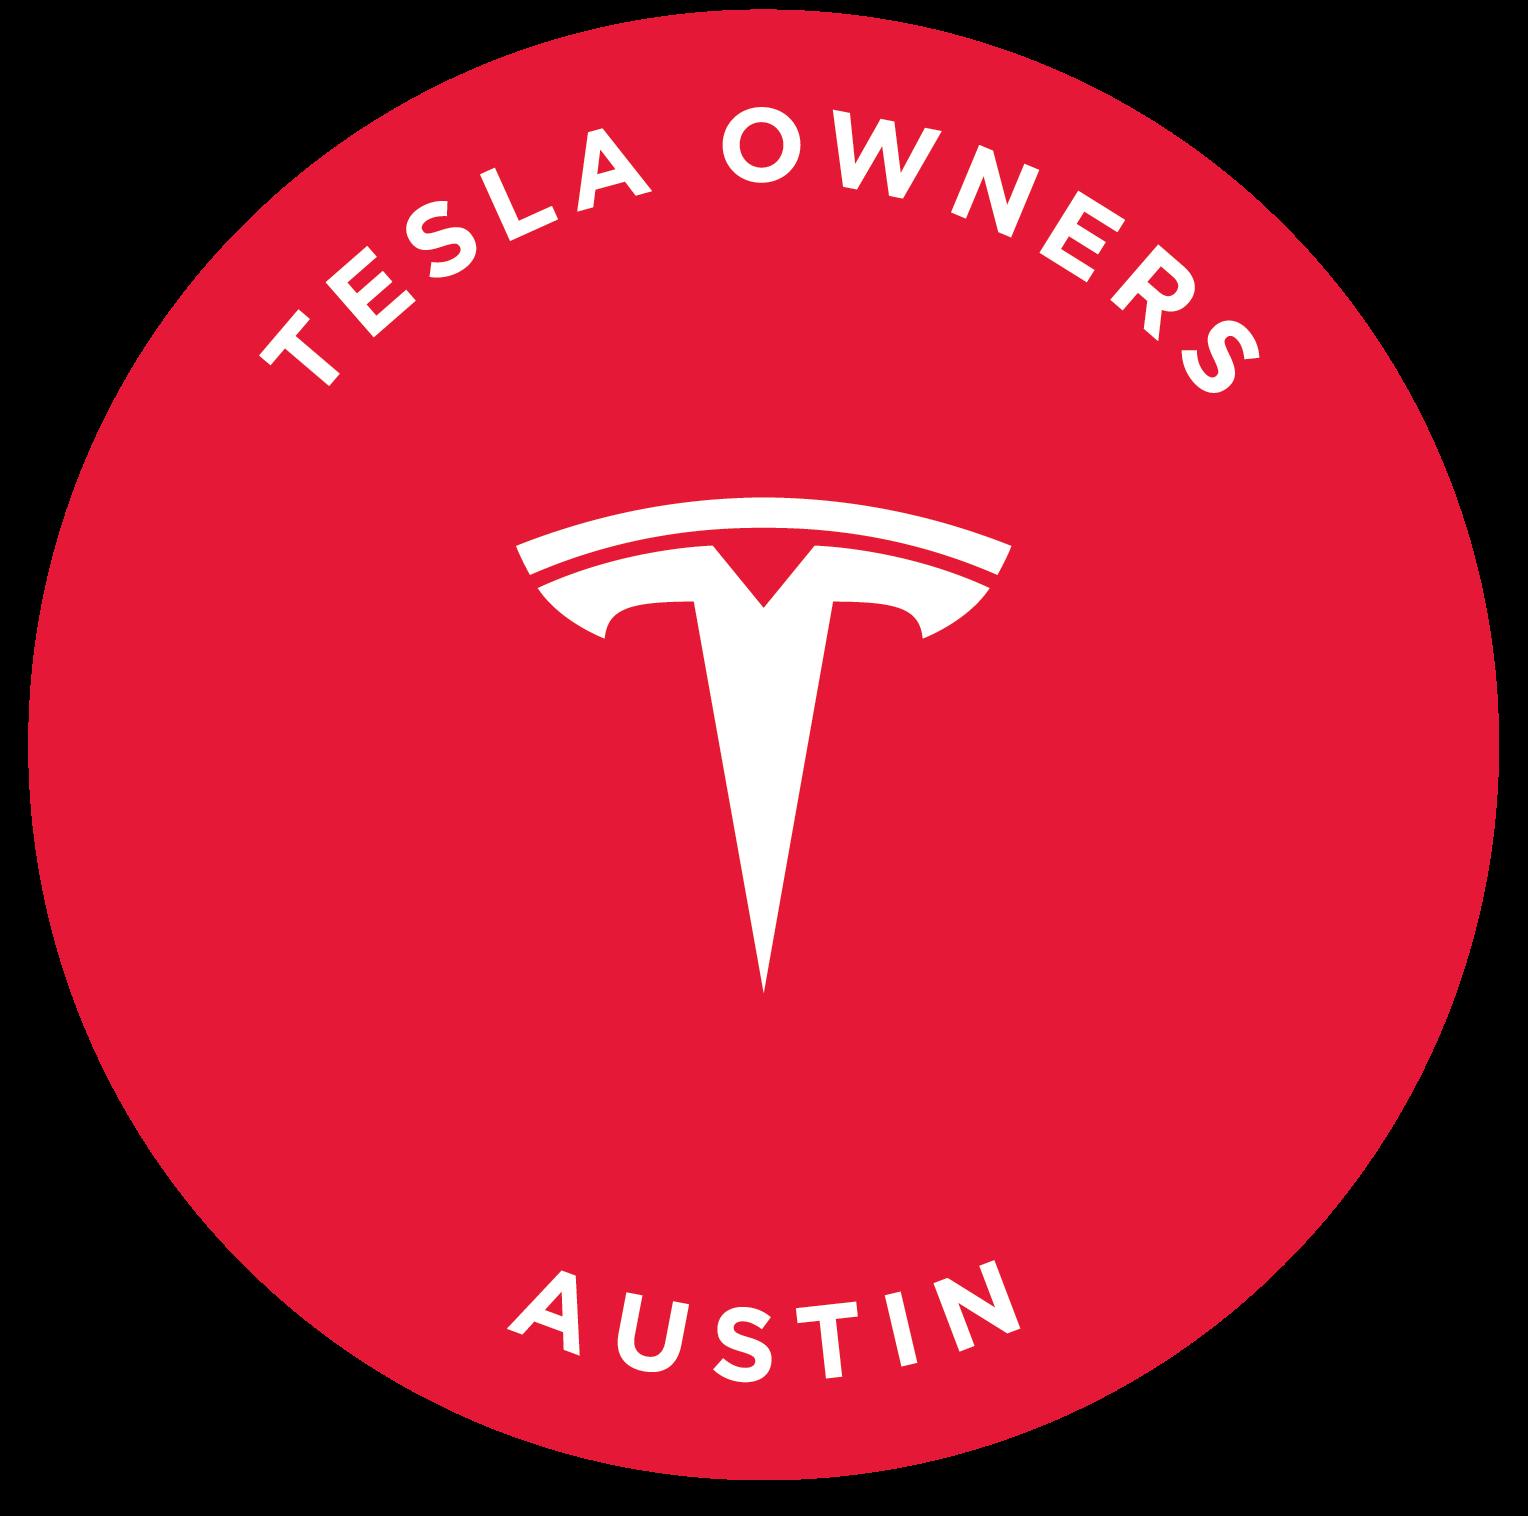 Tesla Owners Club of Austin